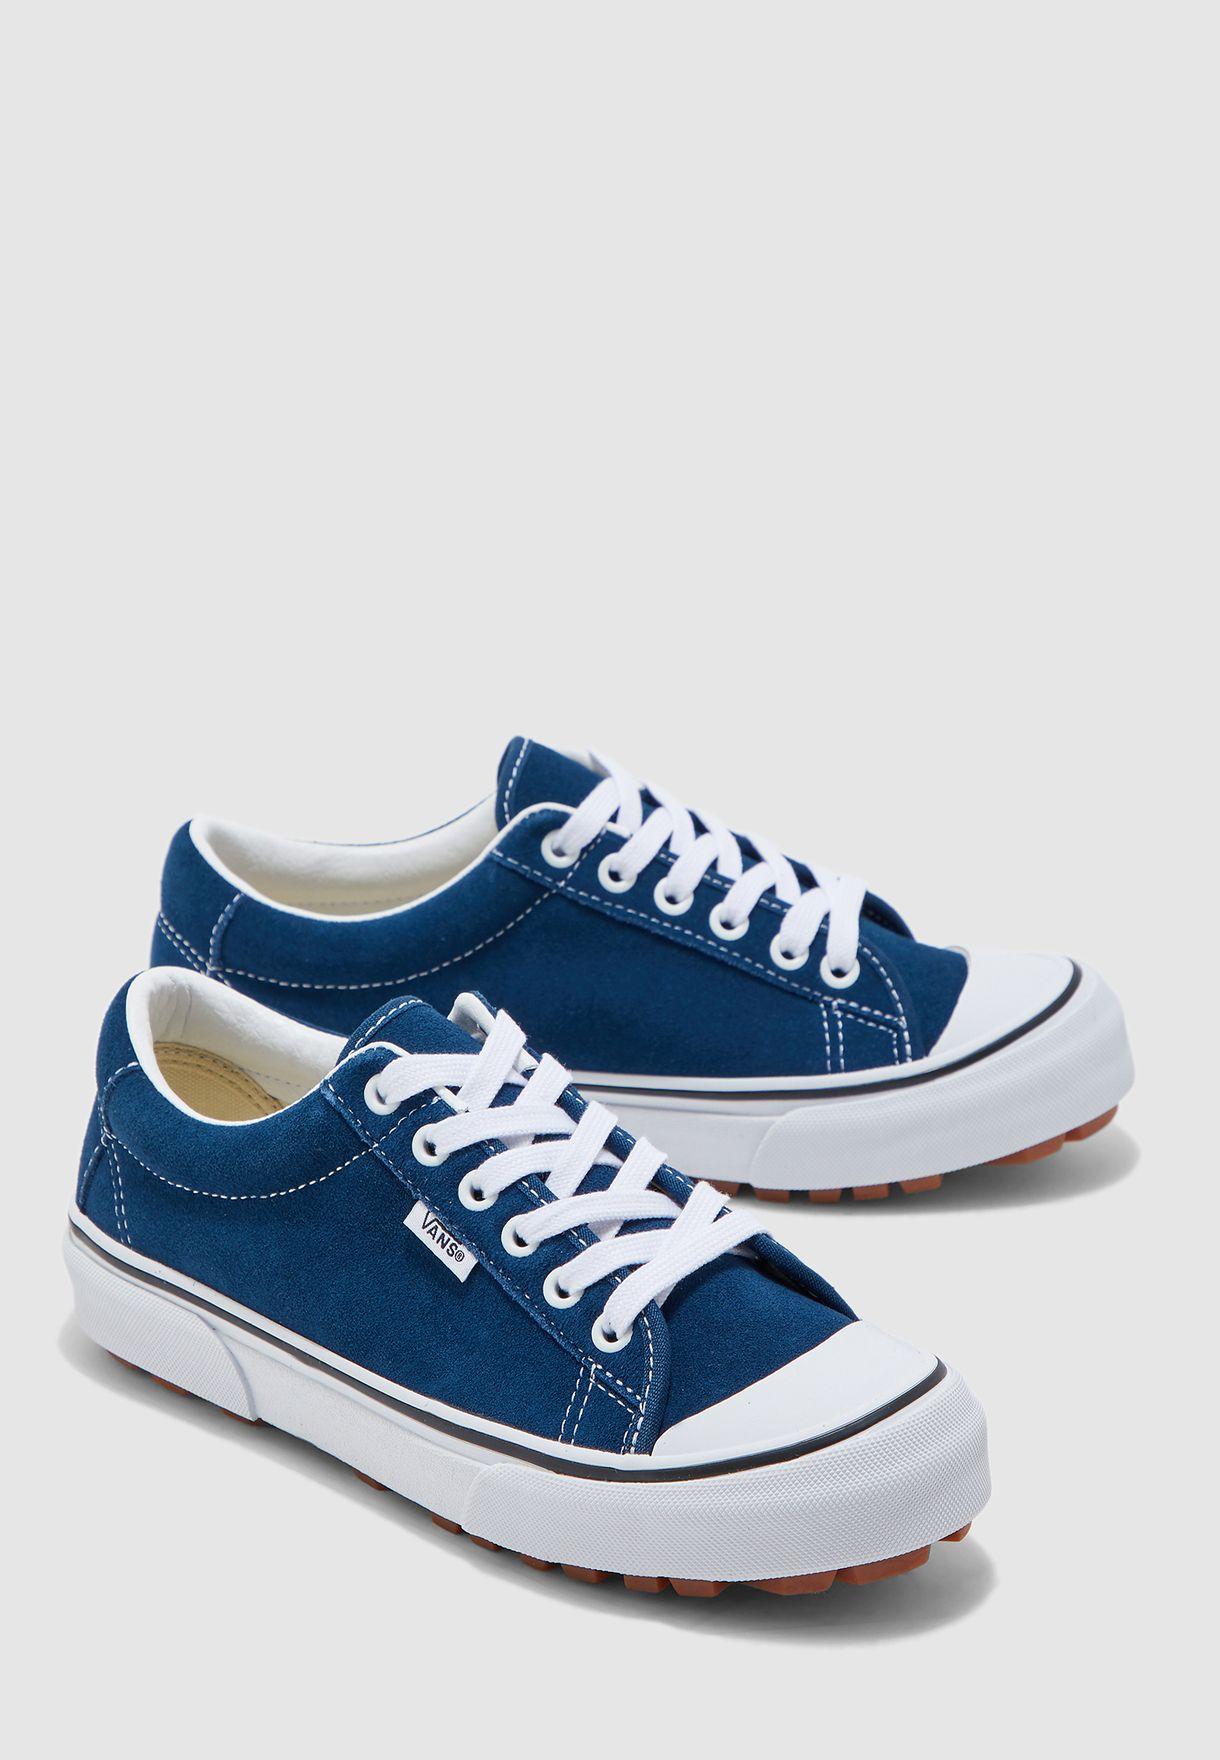 vans style 29